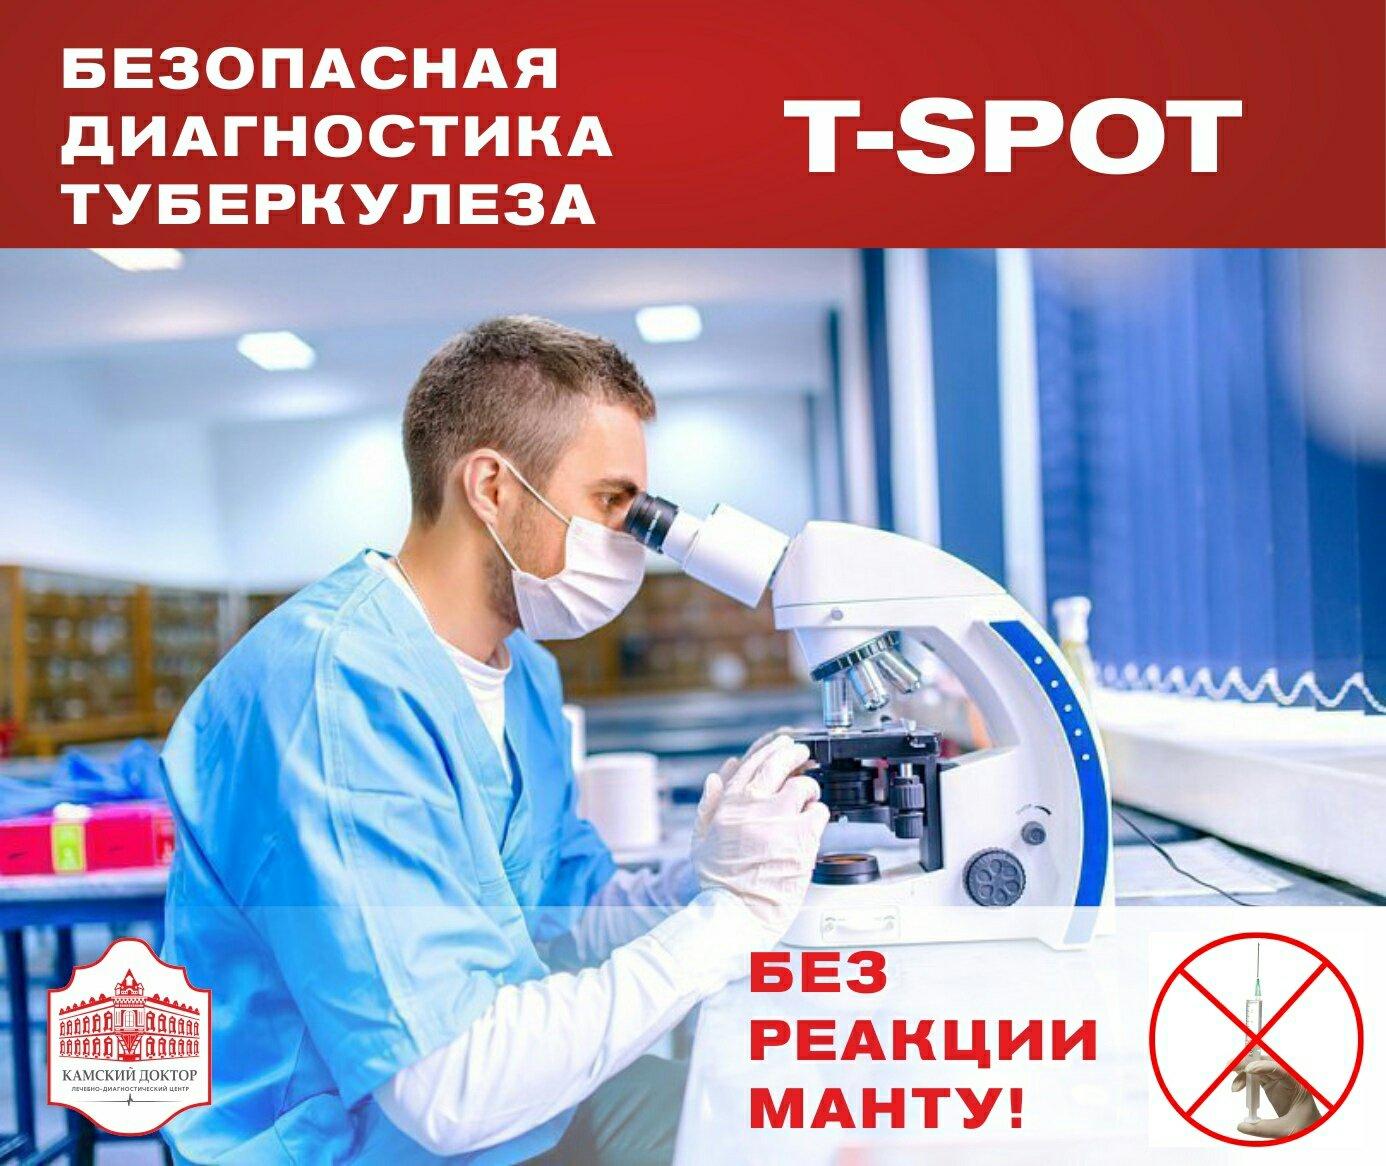 Безопасная диагностика туберкулёза